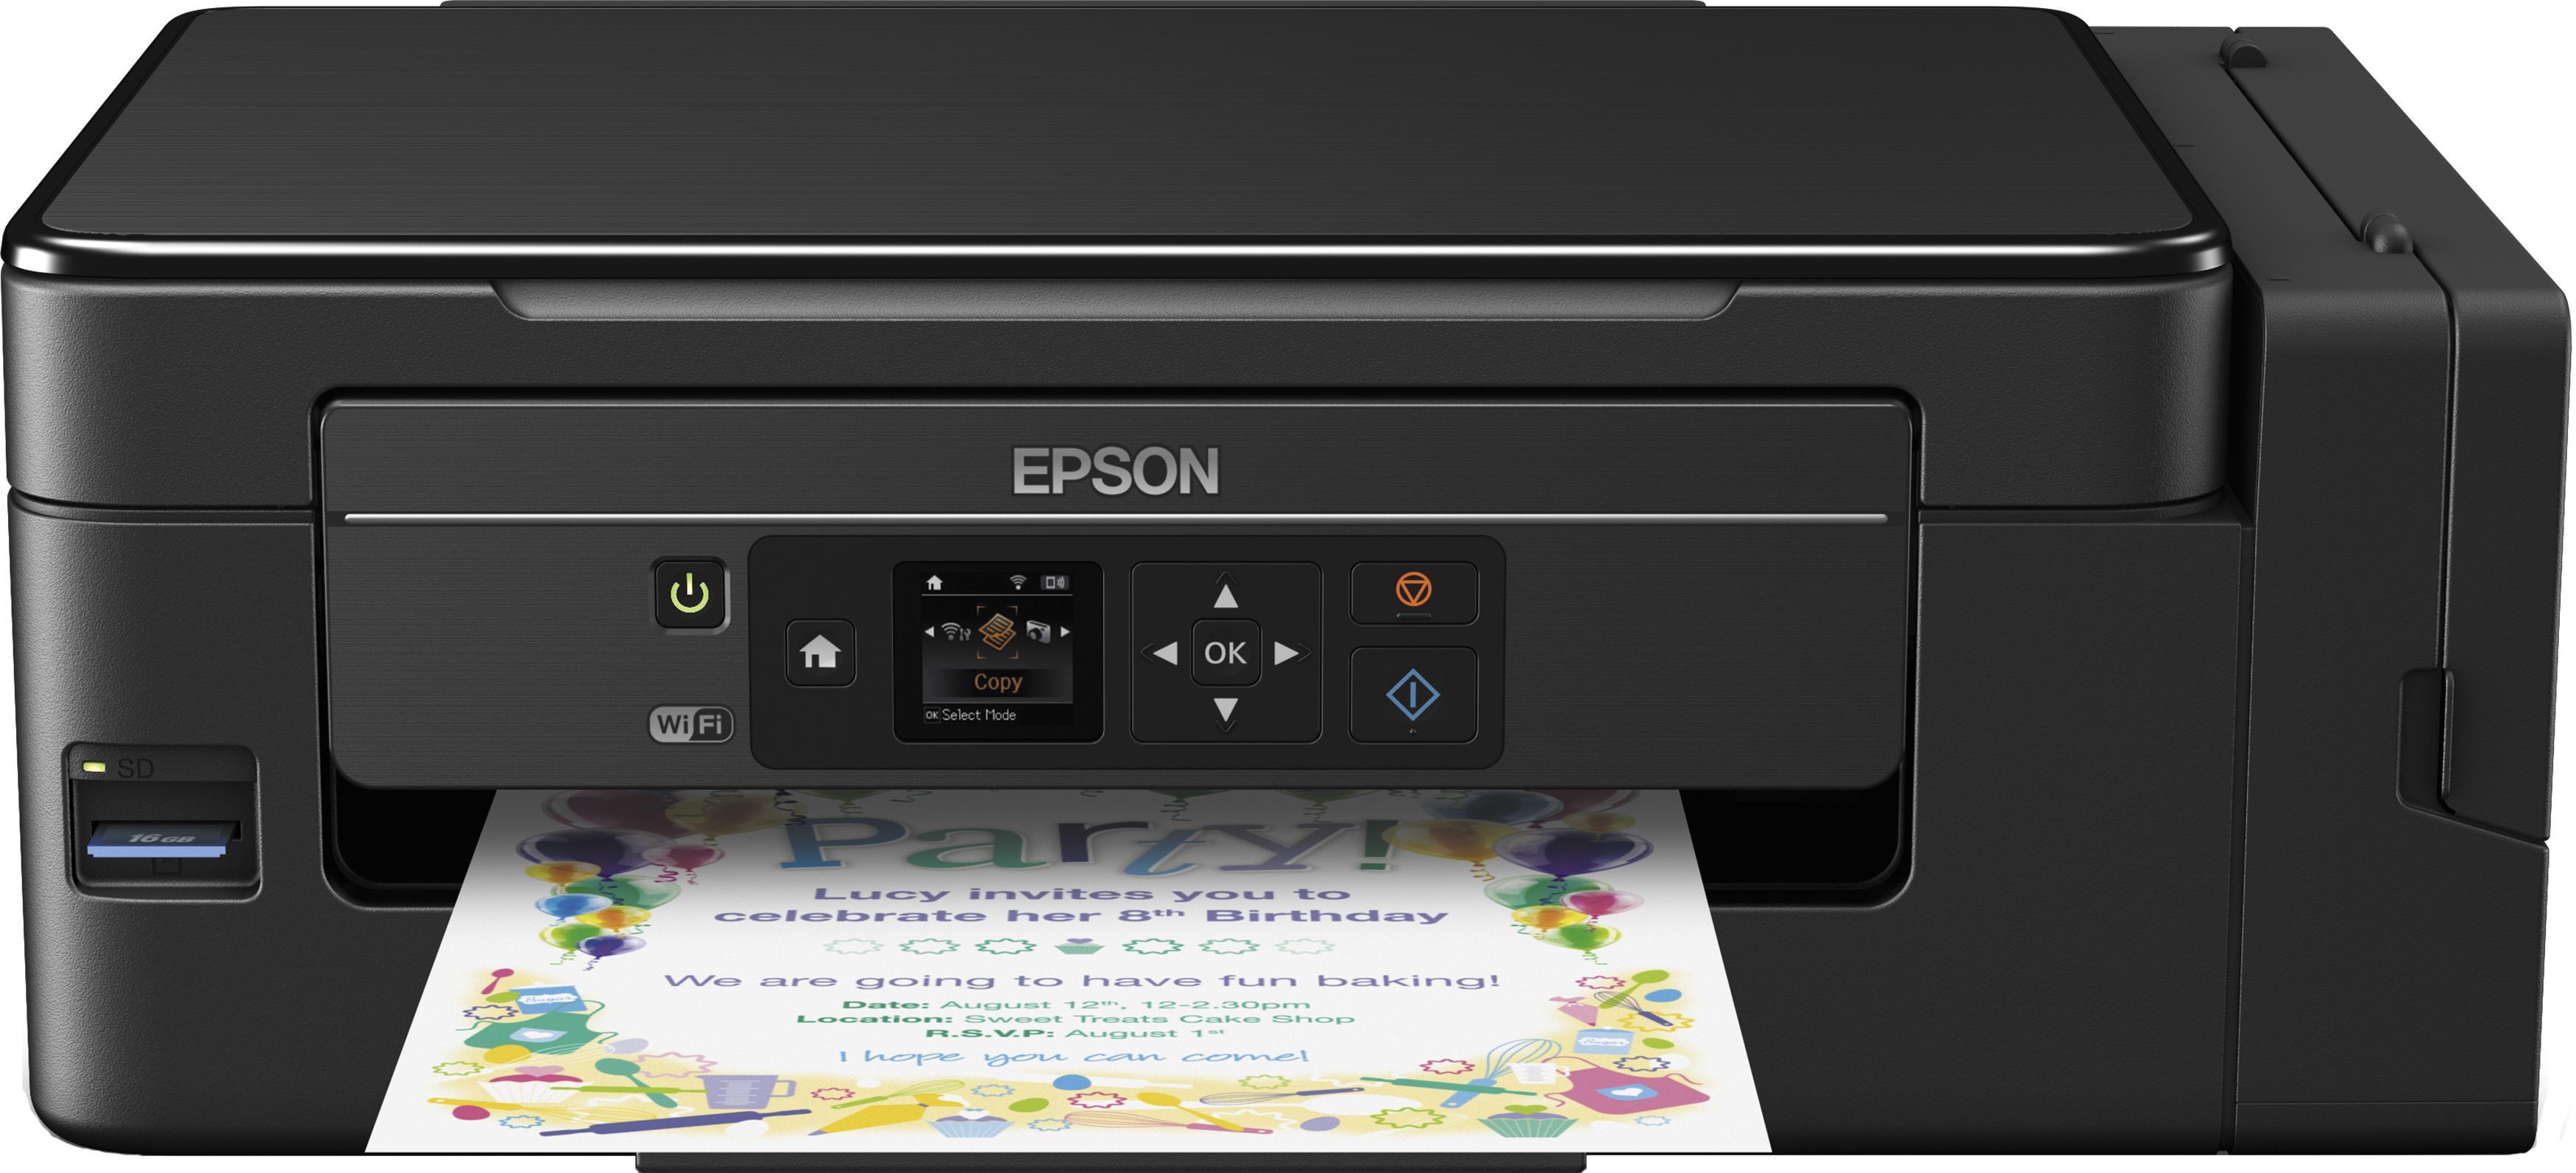 epson ecotank et 2650 multifunktionsdrucker wlan wi fi. Black Bedroom Furniture Sets. Home Design Ideas